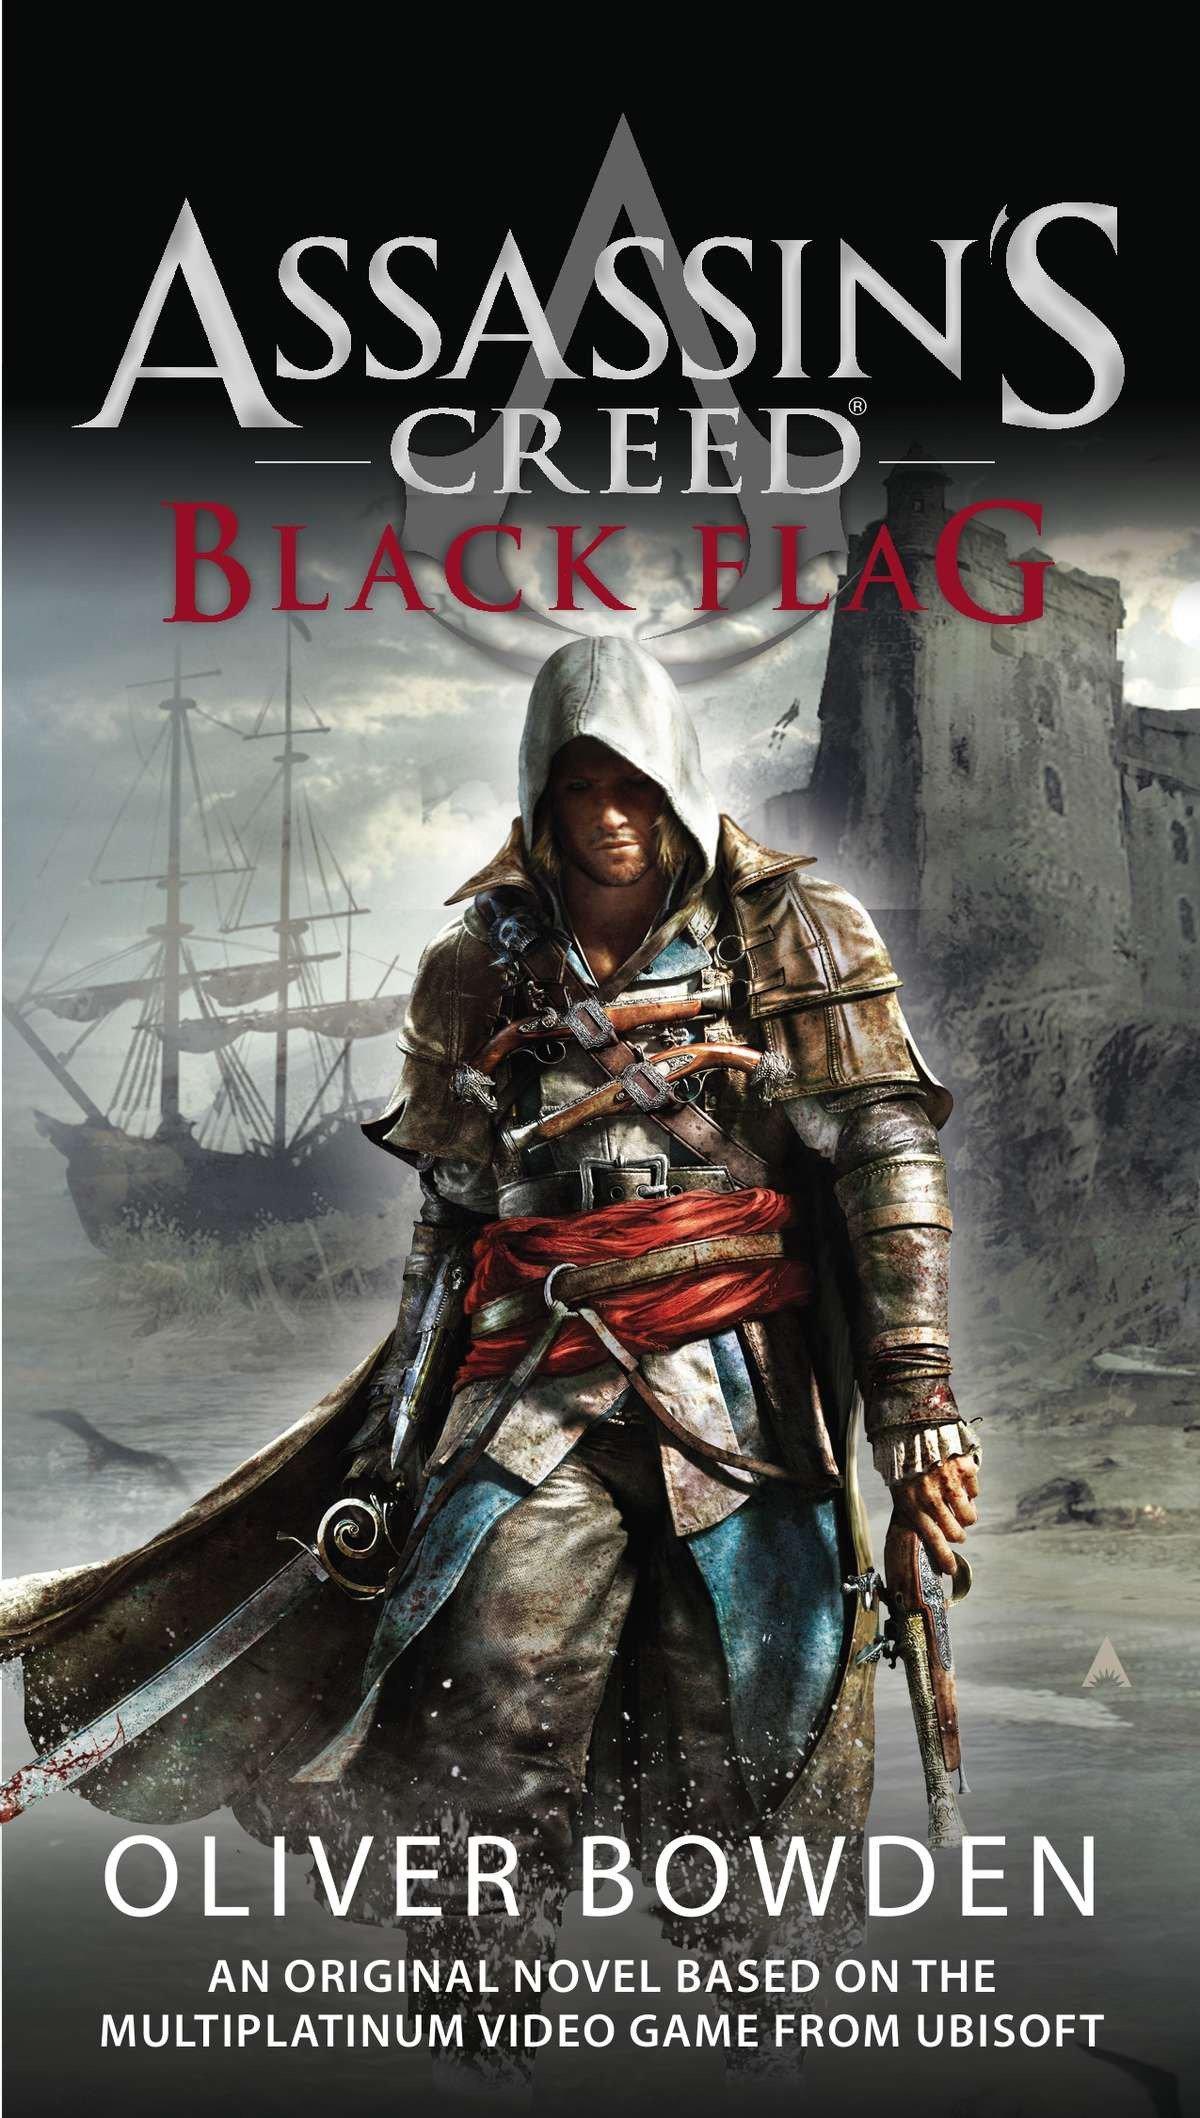 Amazon.com: Assassins Creed: Black Flag (9780425262962 ...